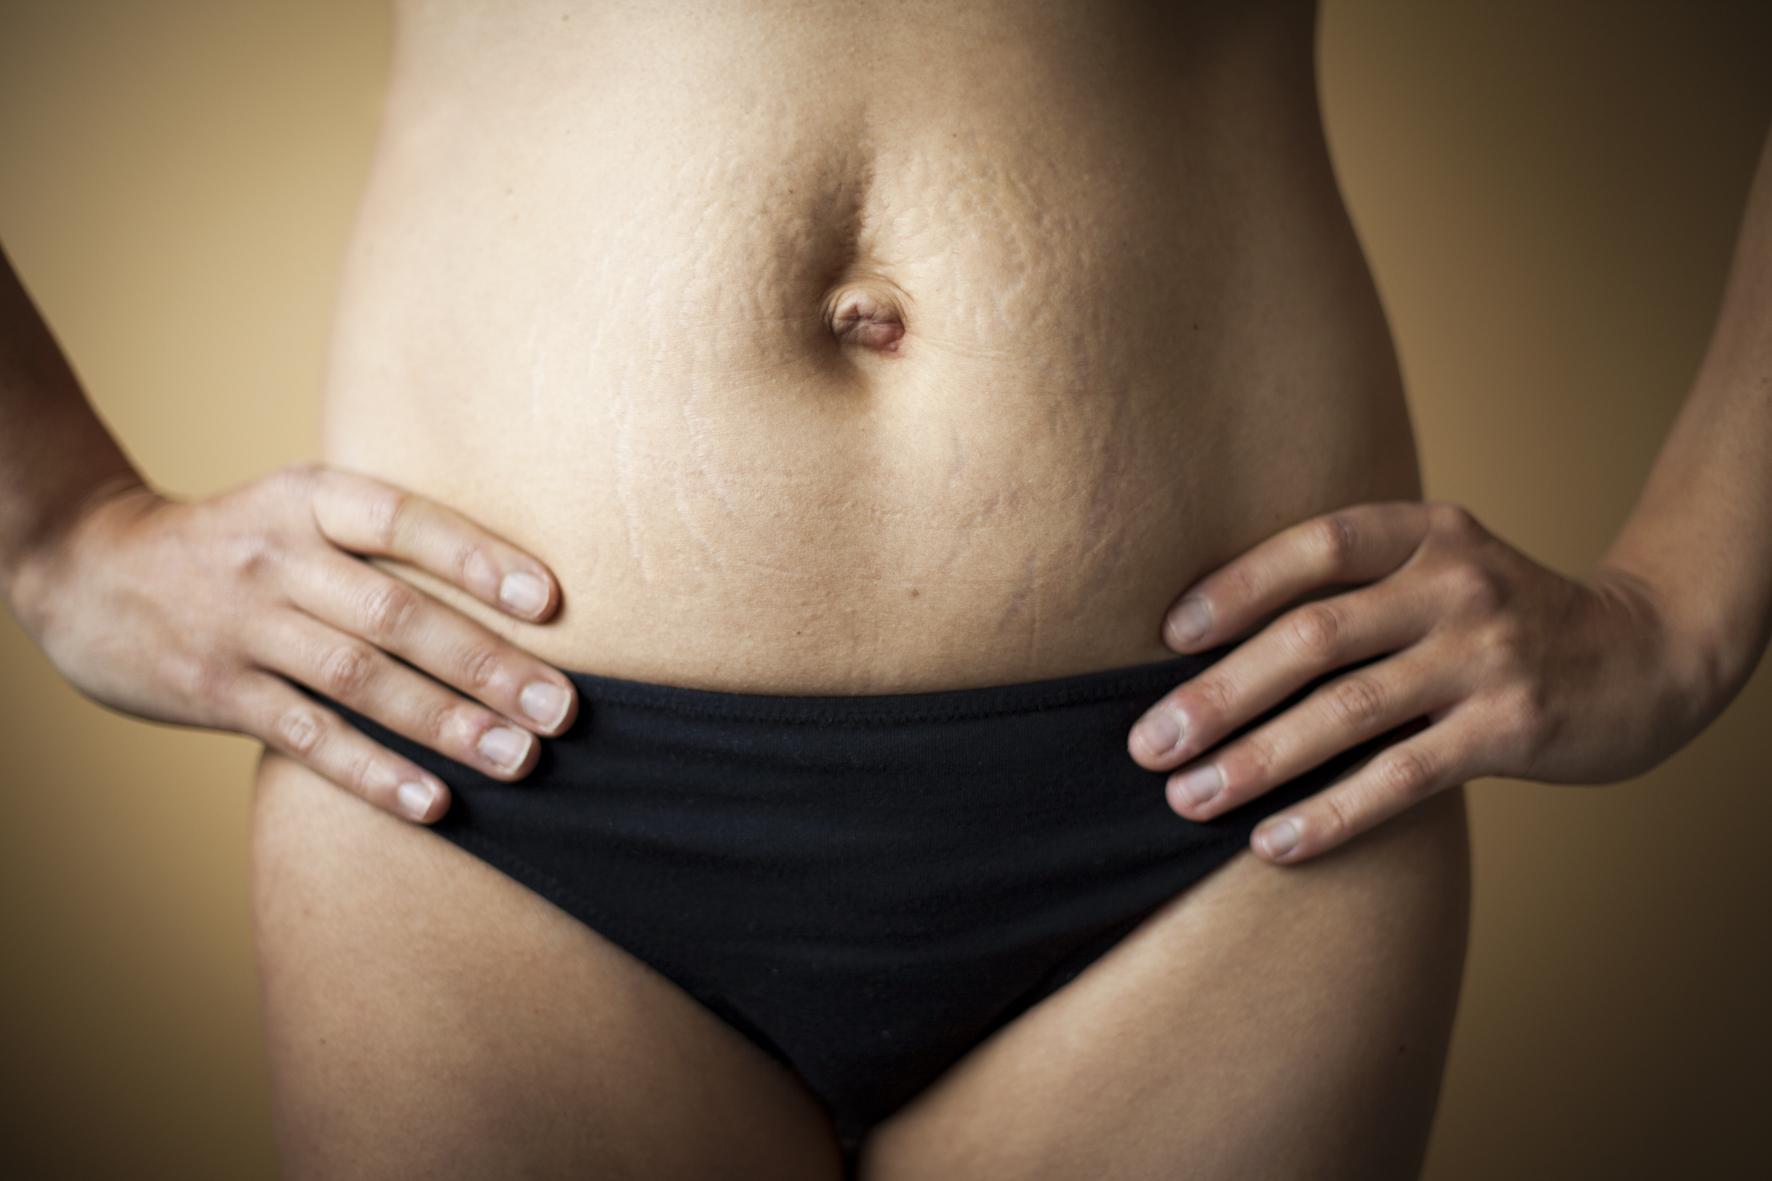 vergetures-ventre-grossesse